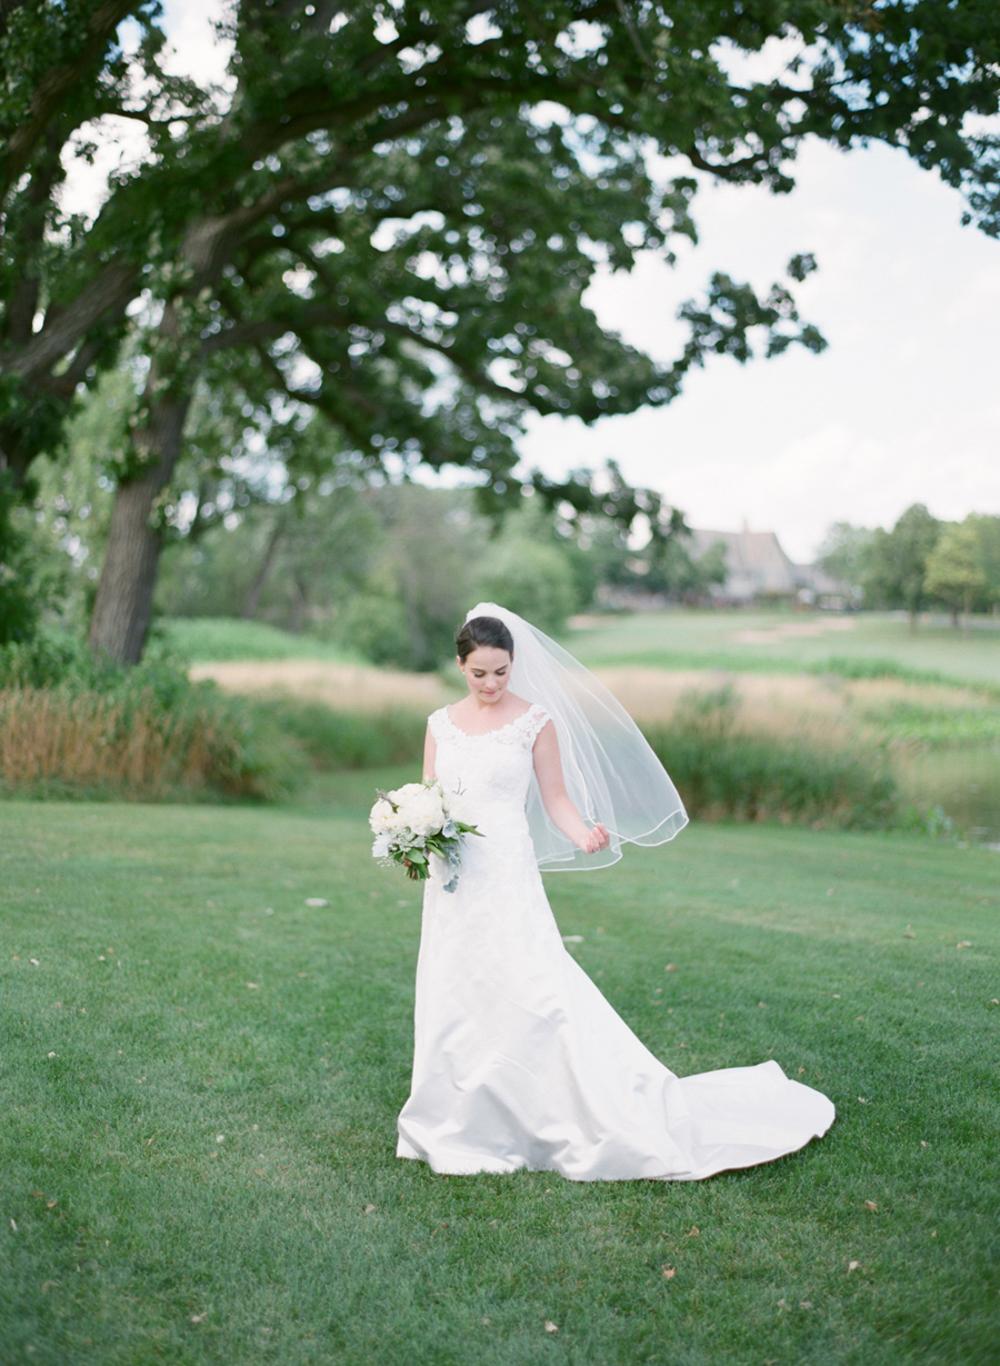 Glen_View_Club_Chicago_wedding_021.jpg